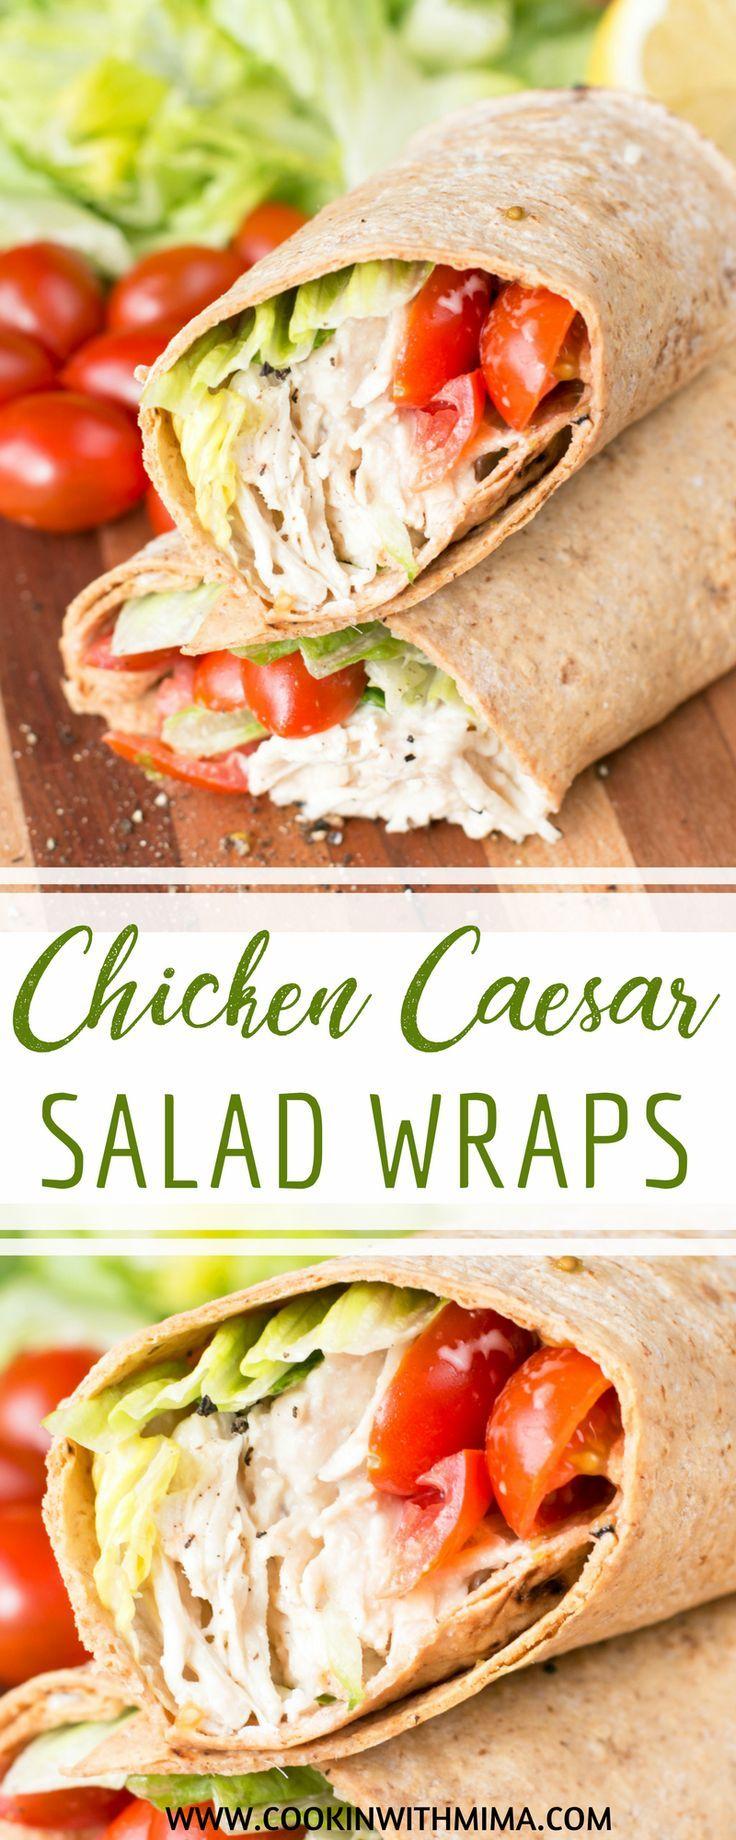 Chicken Caesar Salad Wraps Chicken Recipes Lunch Recipes Quick Lunch Ideas Caesar Sal Caesar Salad Wrap Chicken Caesar Wrap Recipe Chicken Caesar Salad